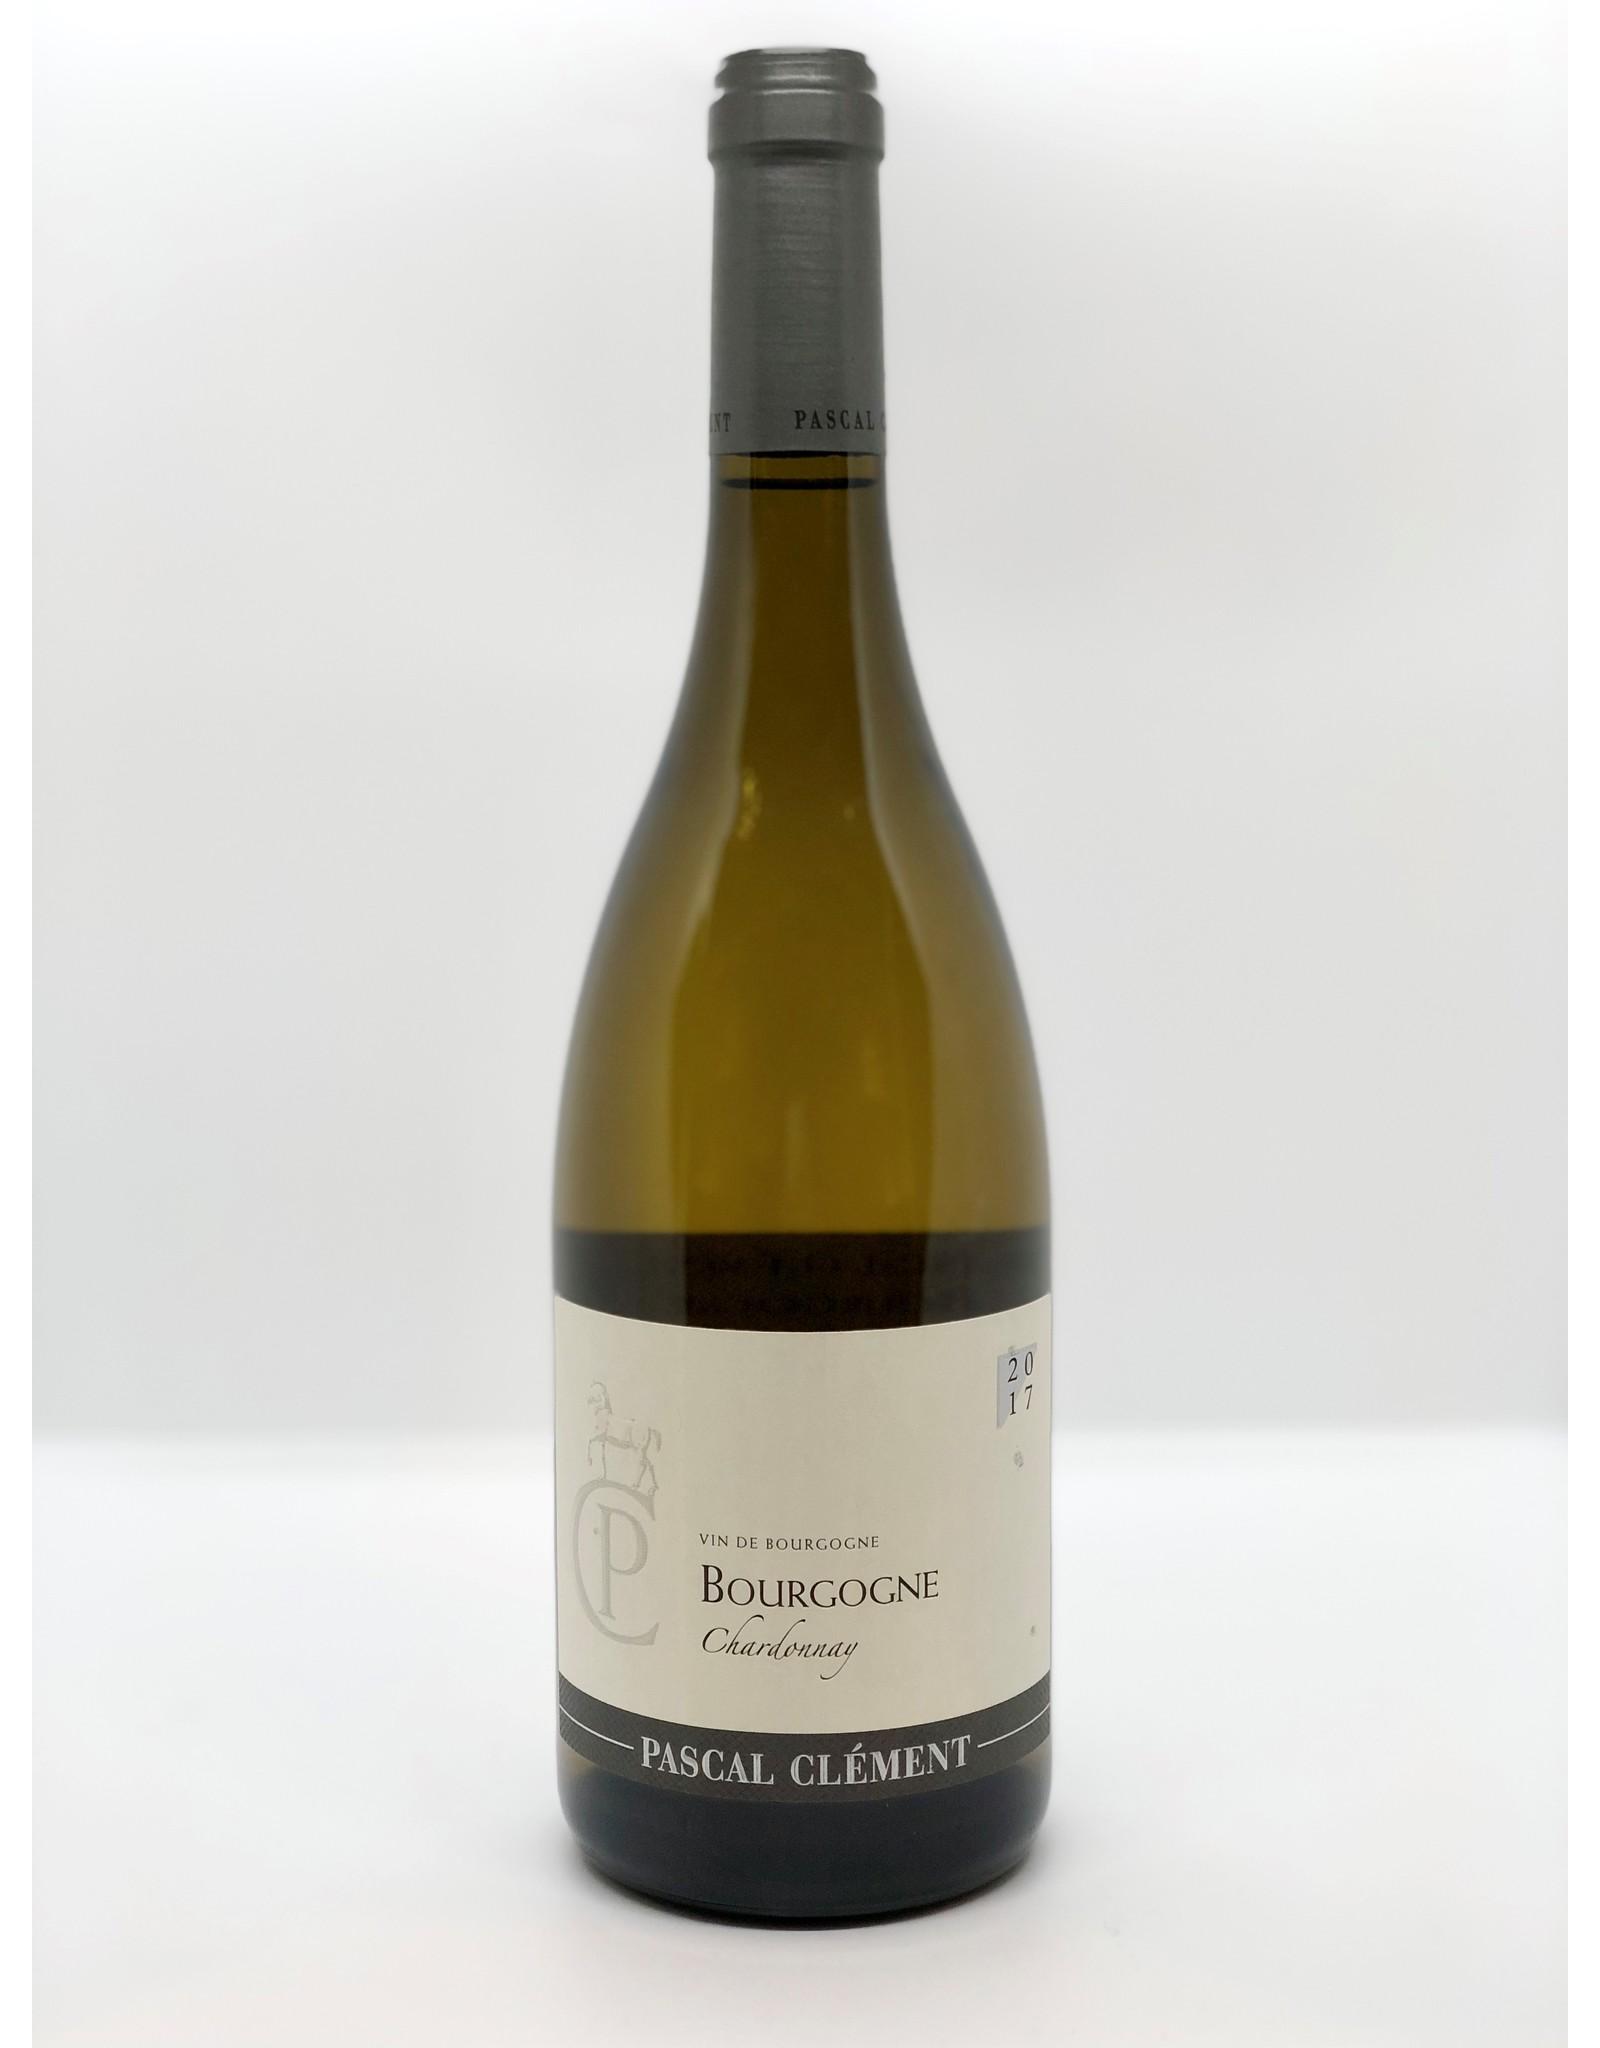 Pascal Clement Bourgogne Chardonnay